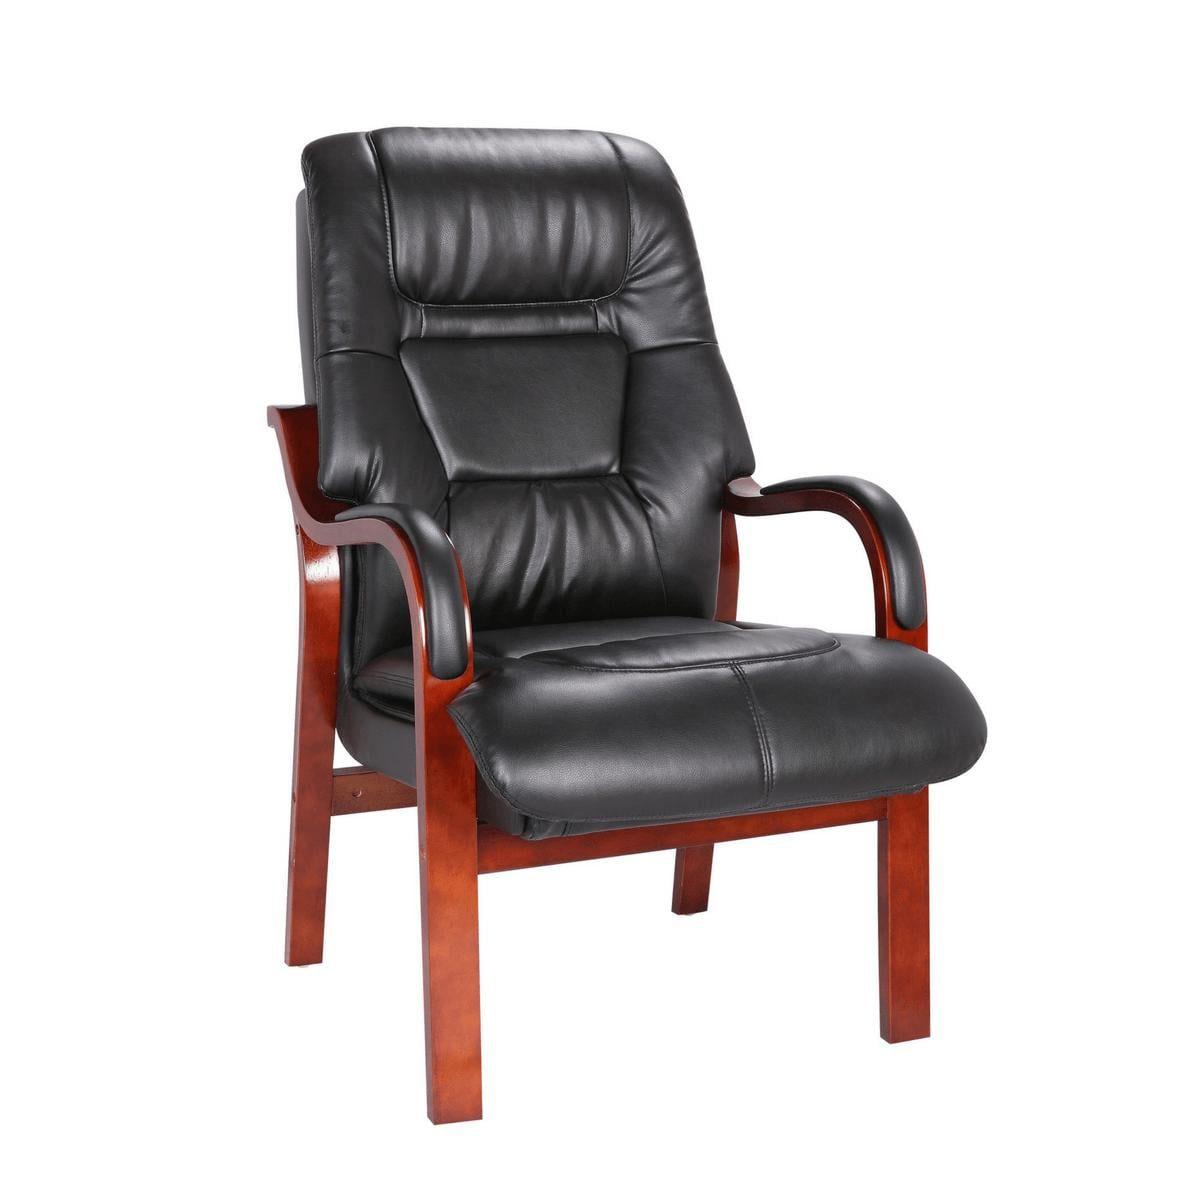 Olly Orthopedic Chair